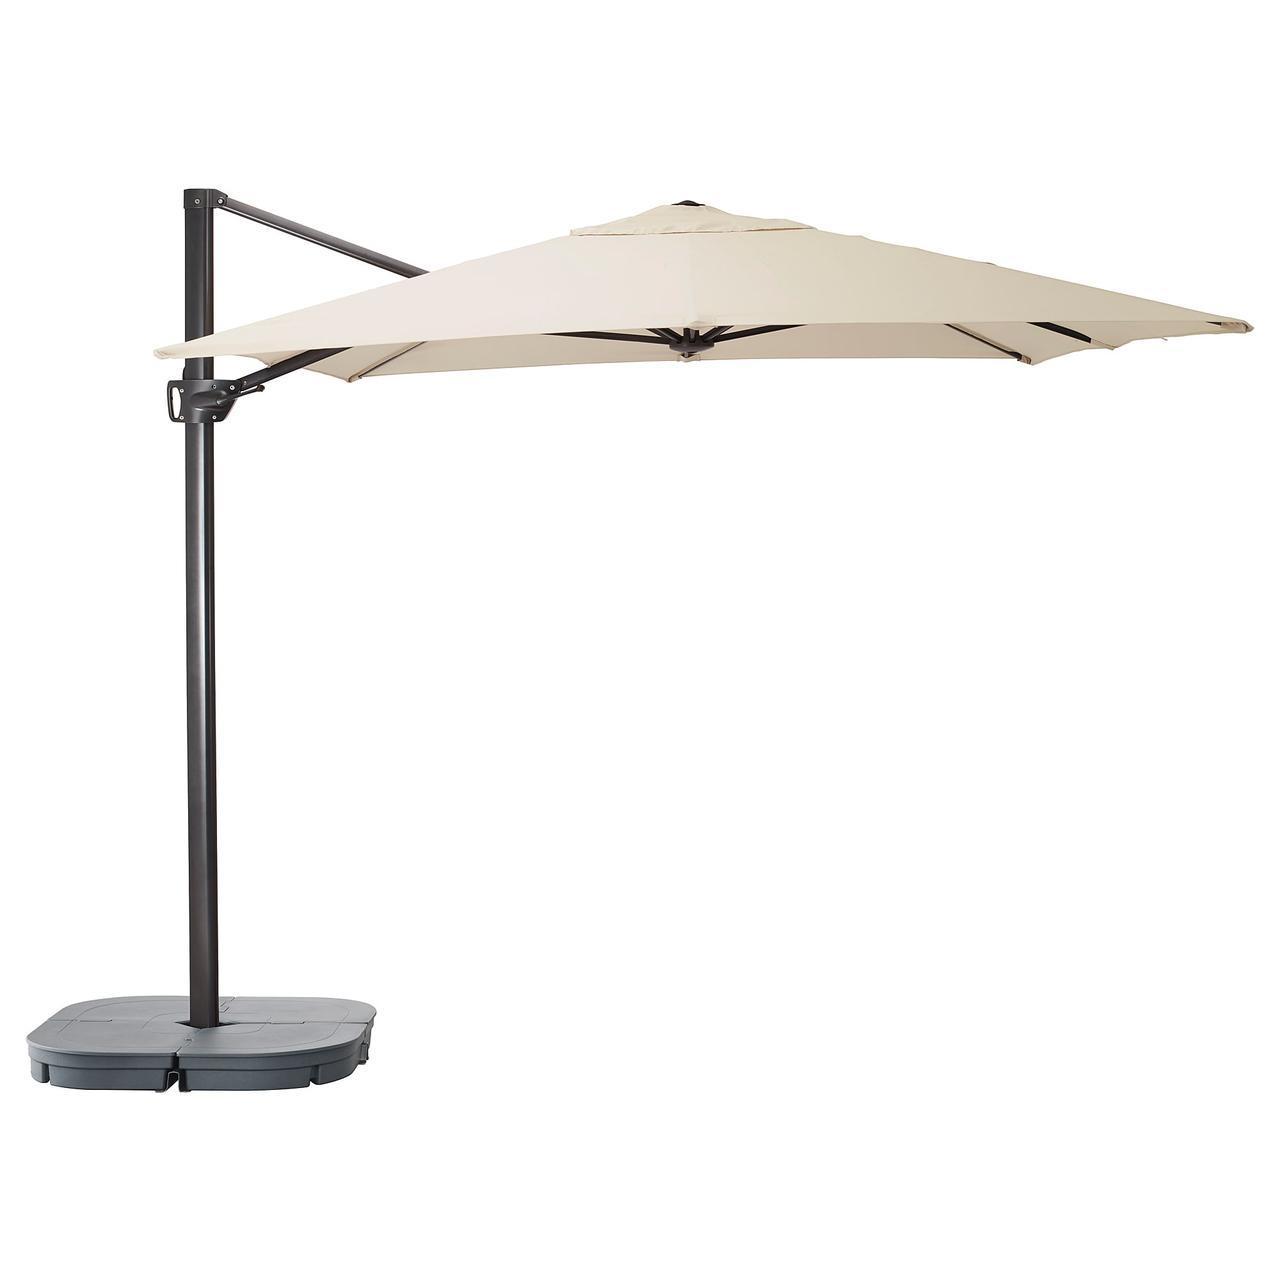 IKEA SEGLARO / SVARTO (492.518.03) Зонтик Бежевый, свисающий с основания, с наклоном темно-серый